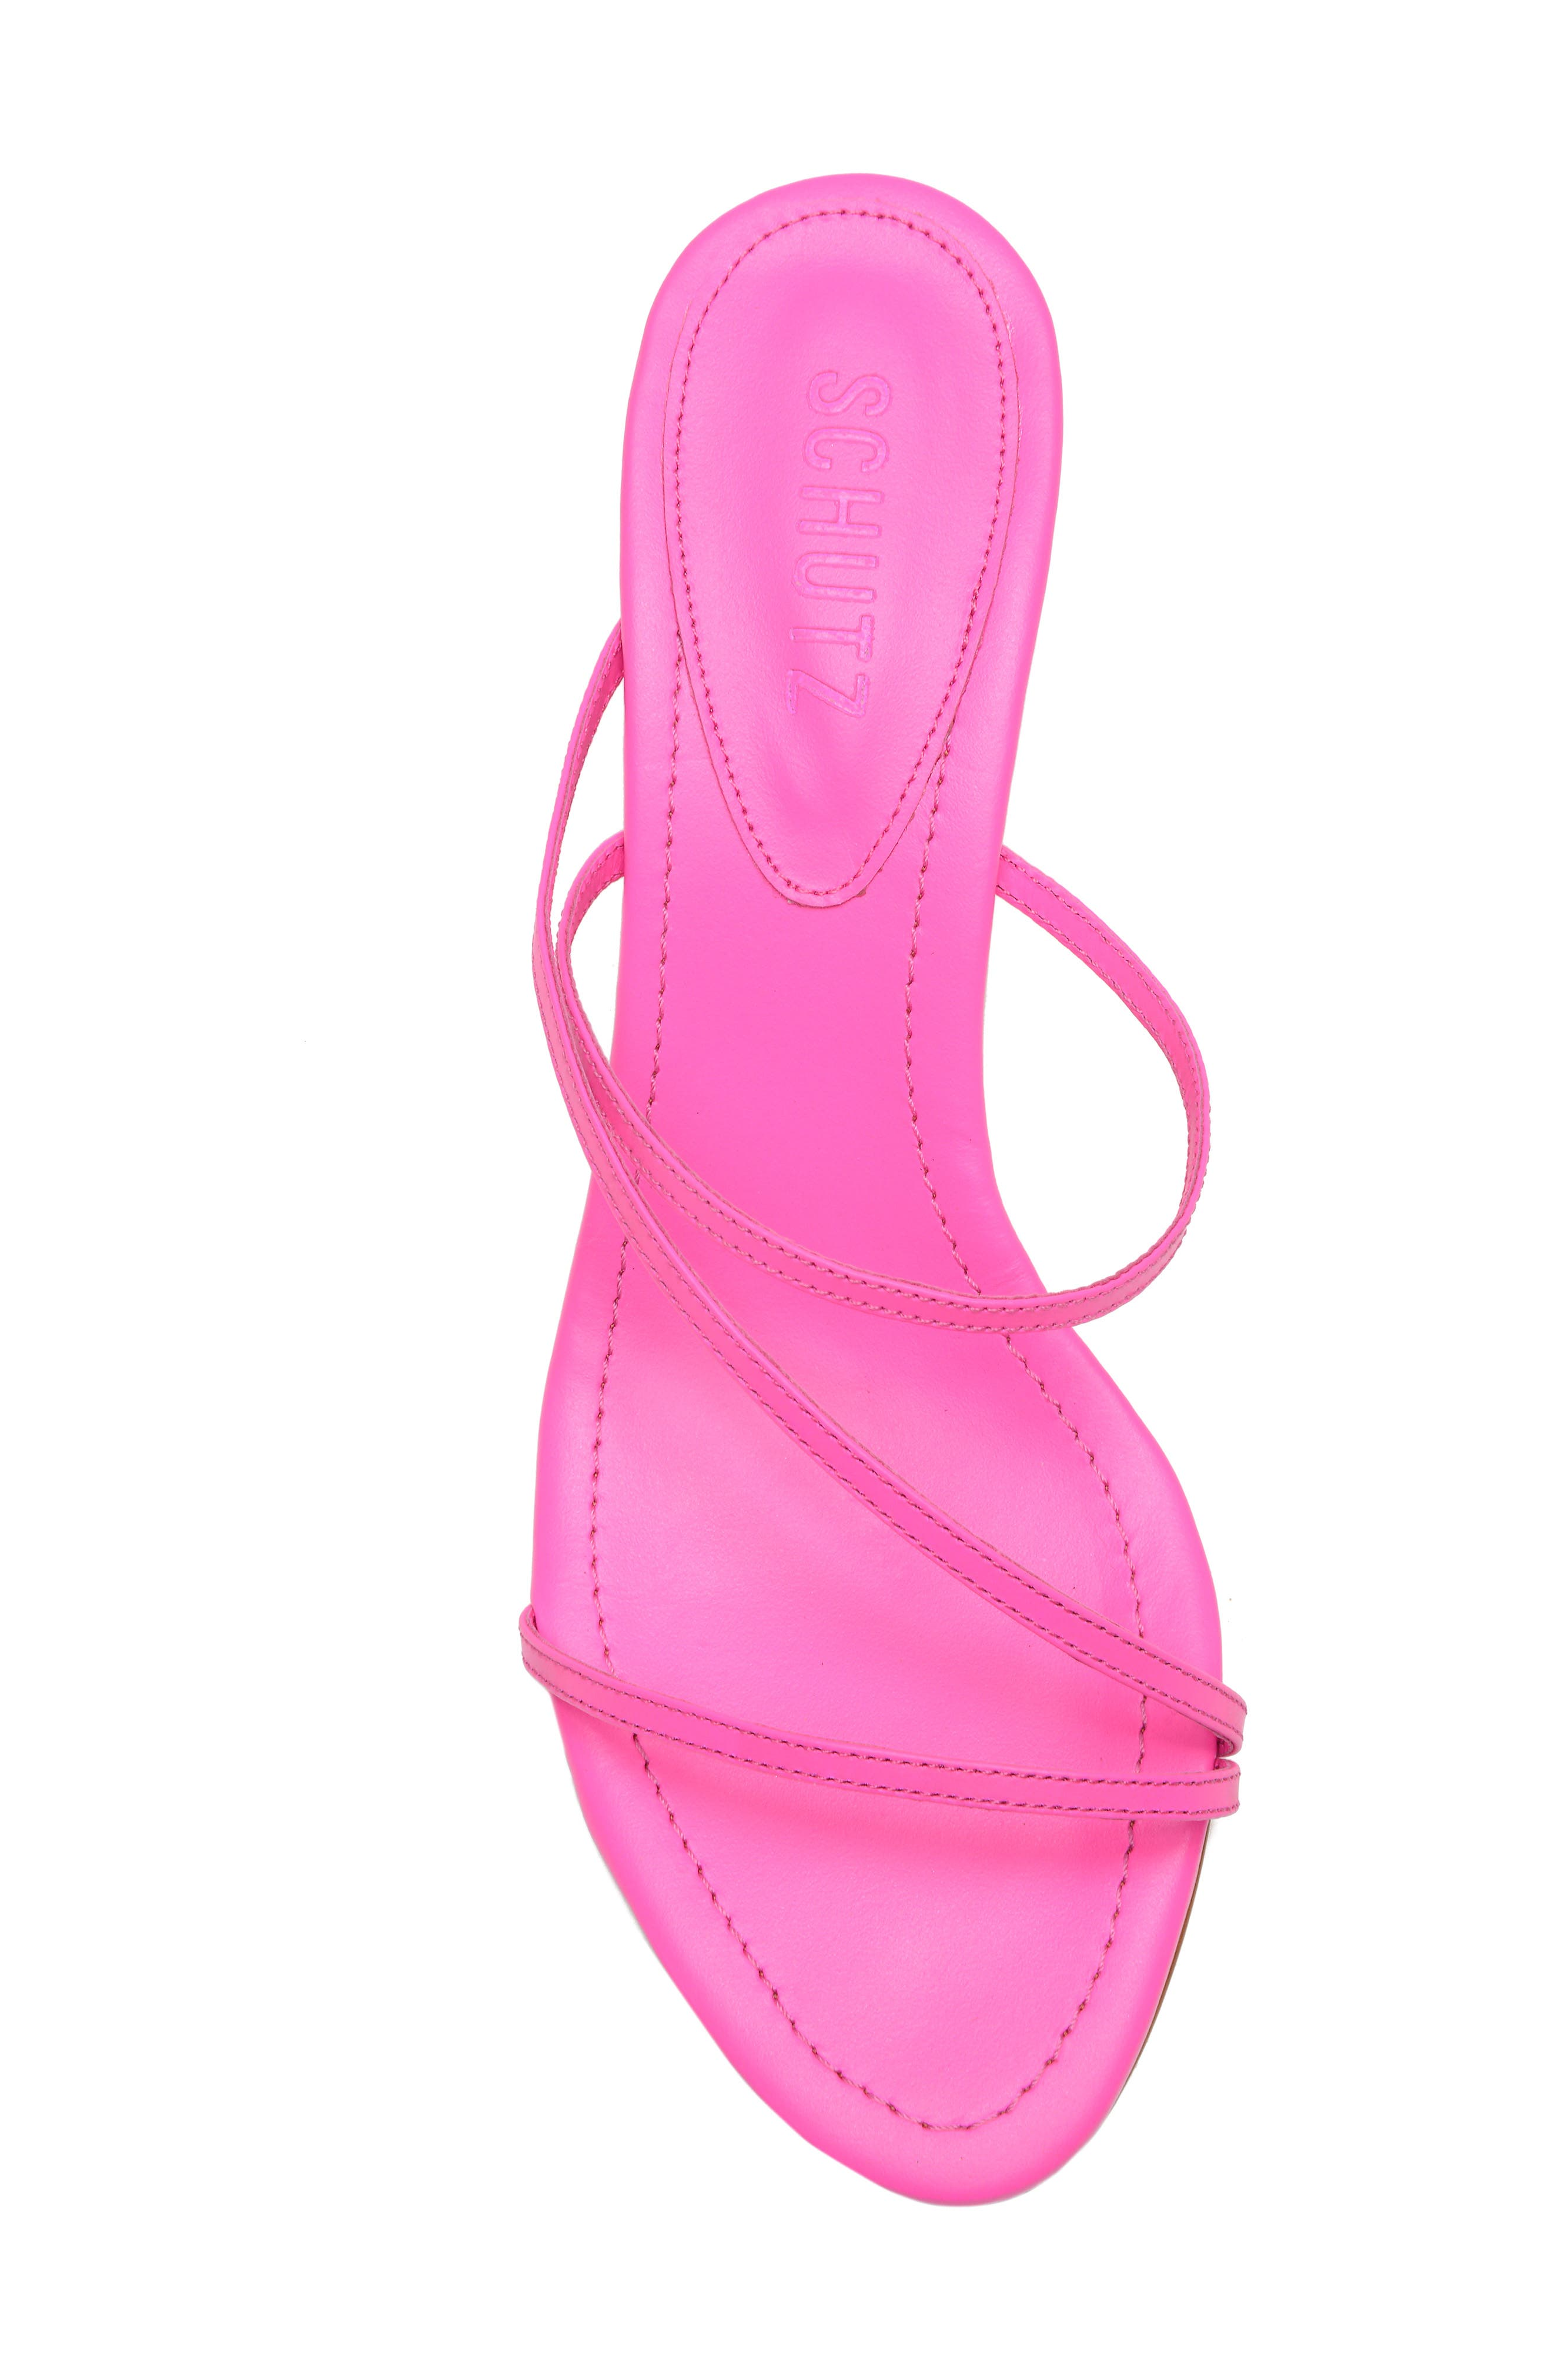 SCHUTZ, Evenise Slide Sandal, Alternate thumbnail 5, color, NEON PINK